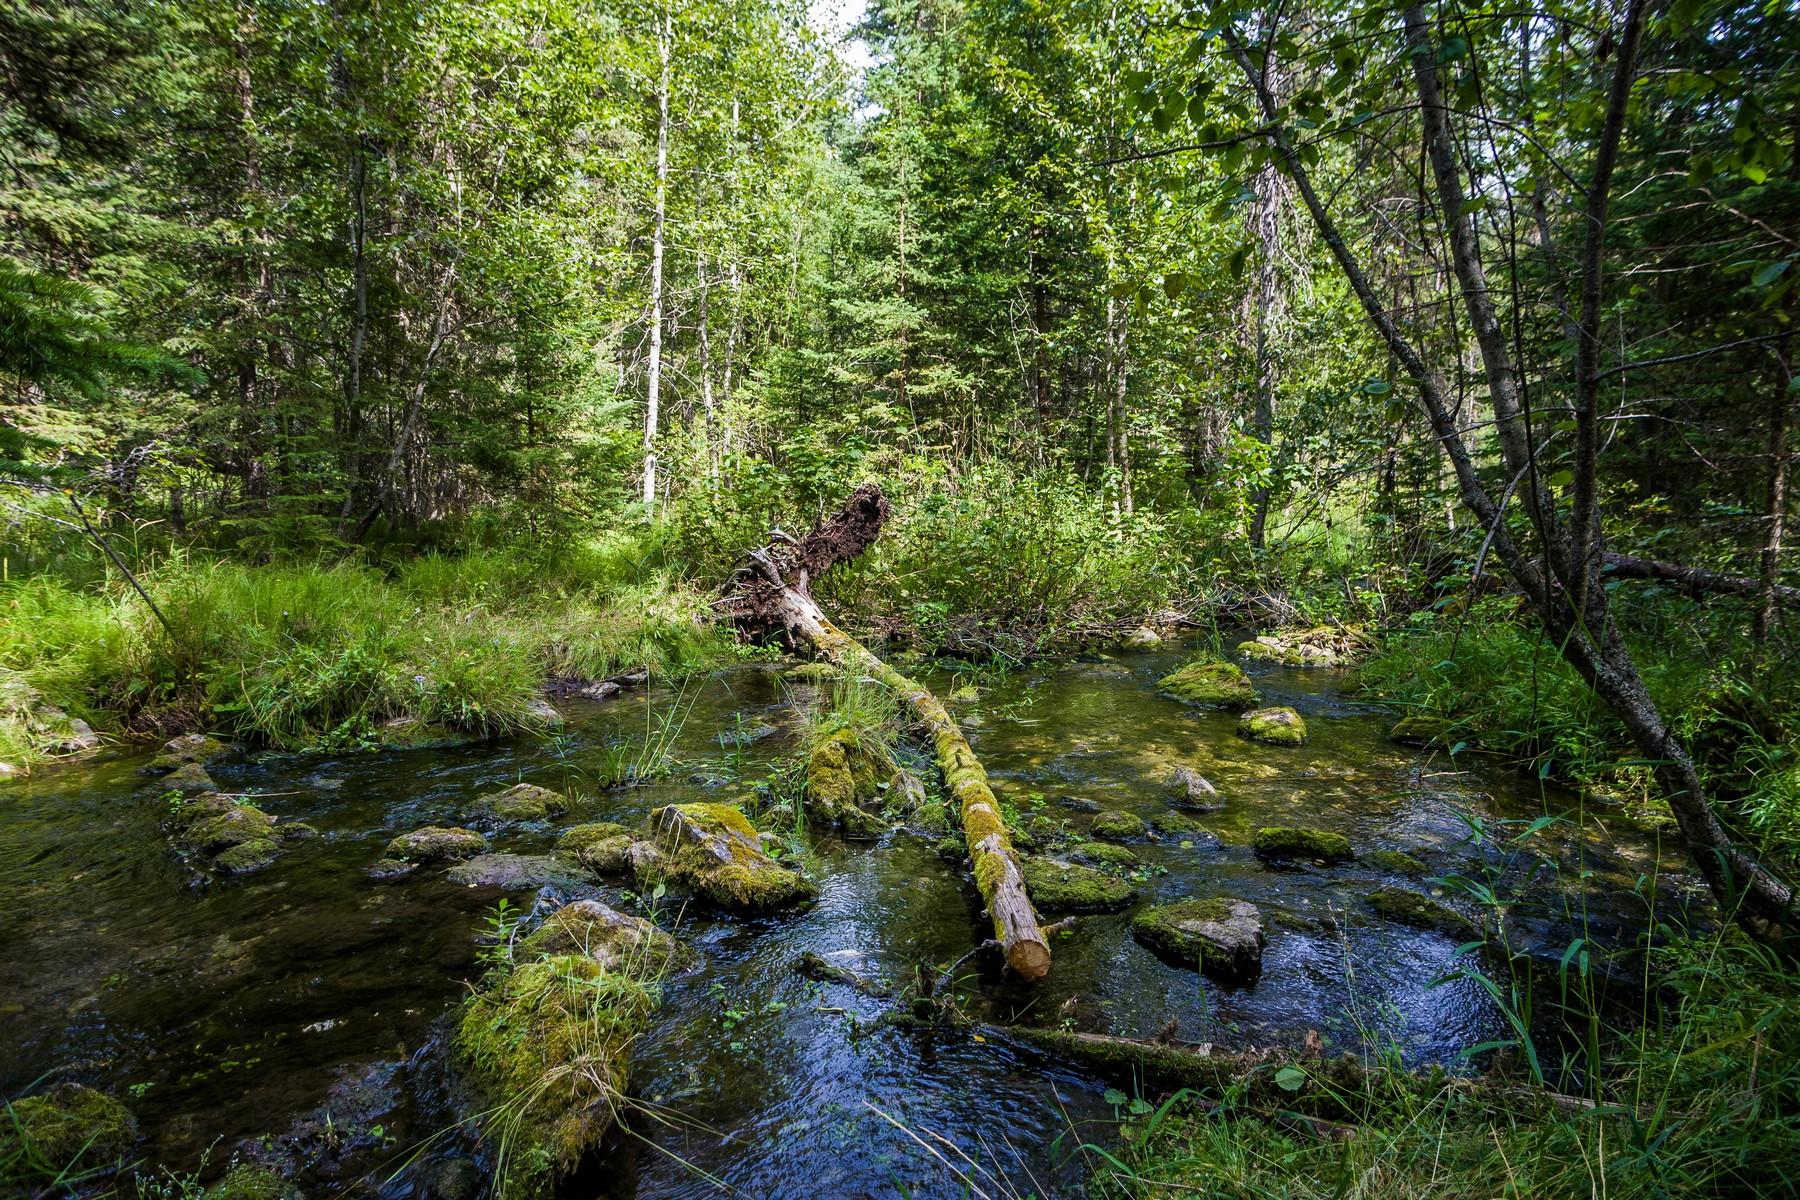 Terreno por un Venta en 974 Rhodes, Kalispell, MT 59901 974 Rhodes Kalispell, Montana, 59901 Estados Unidos